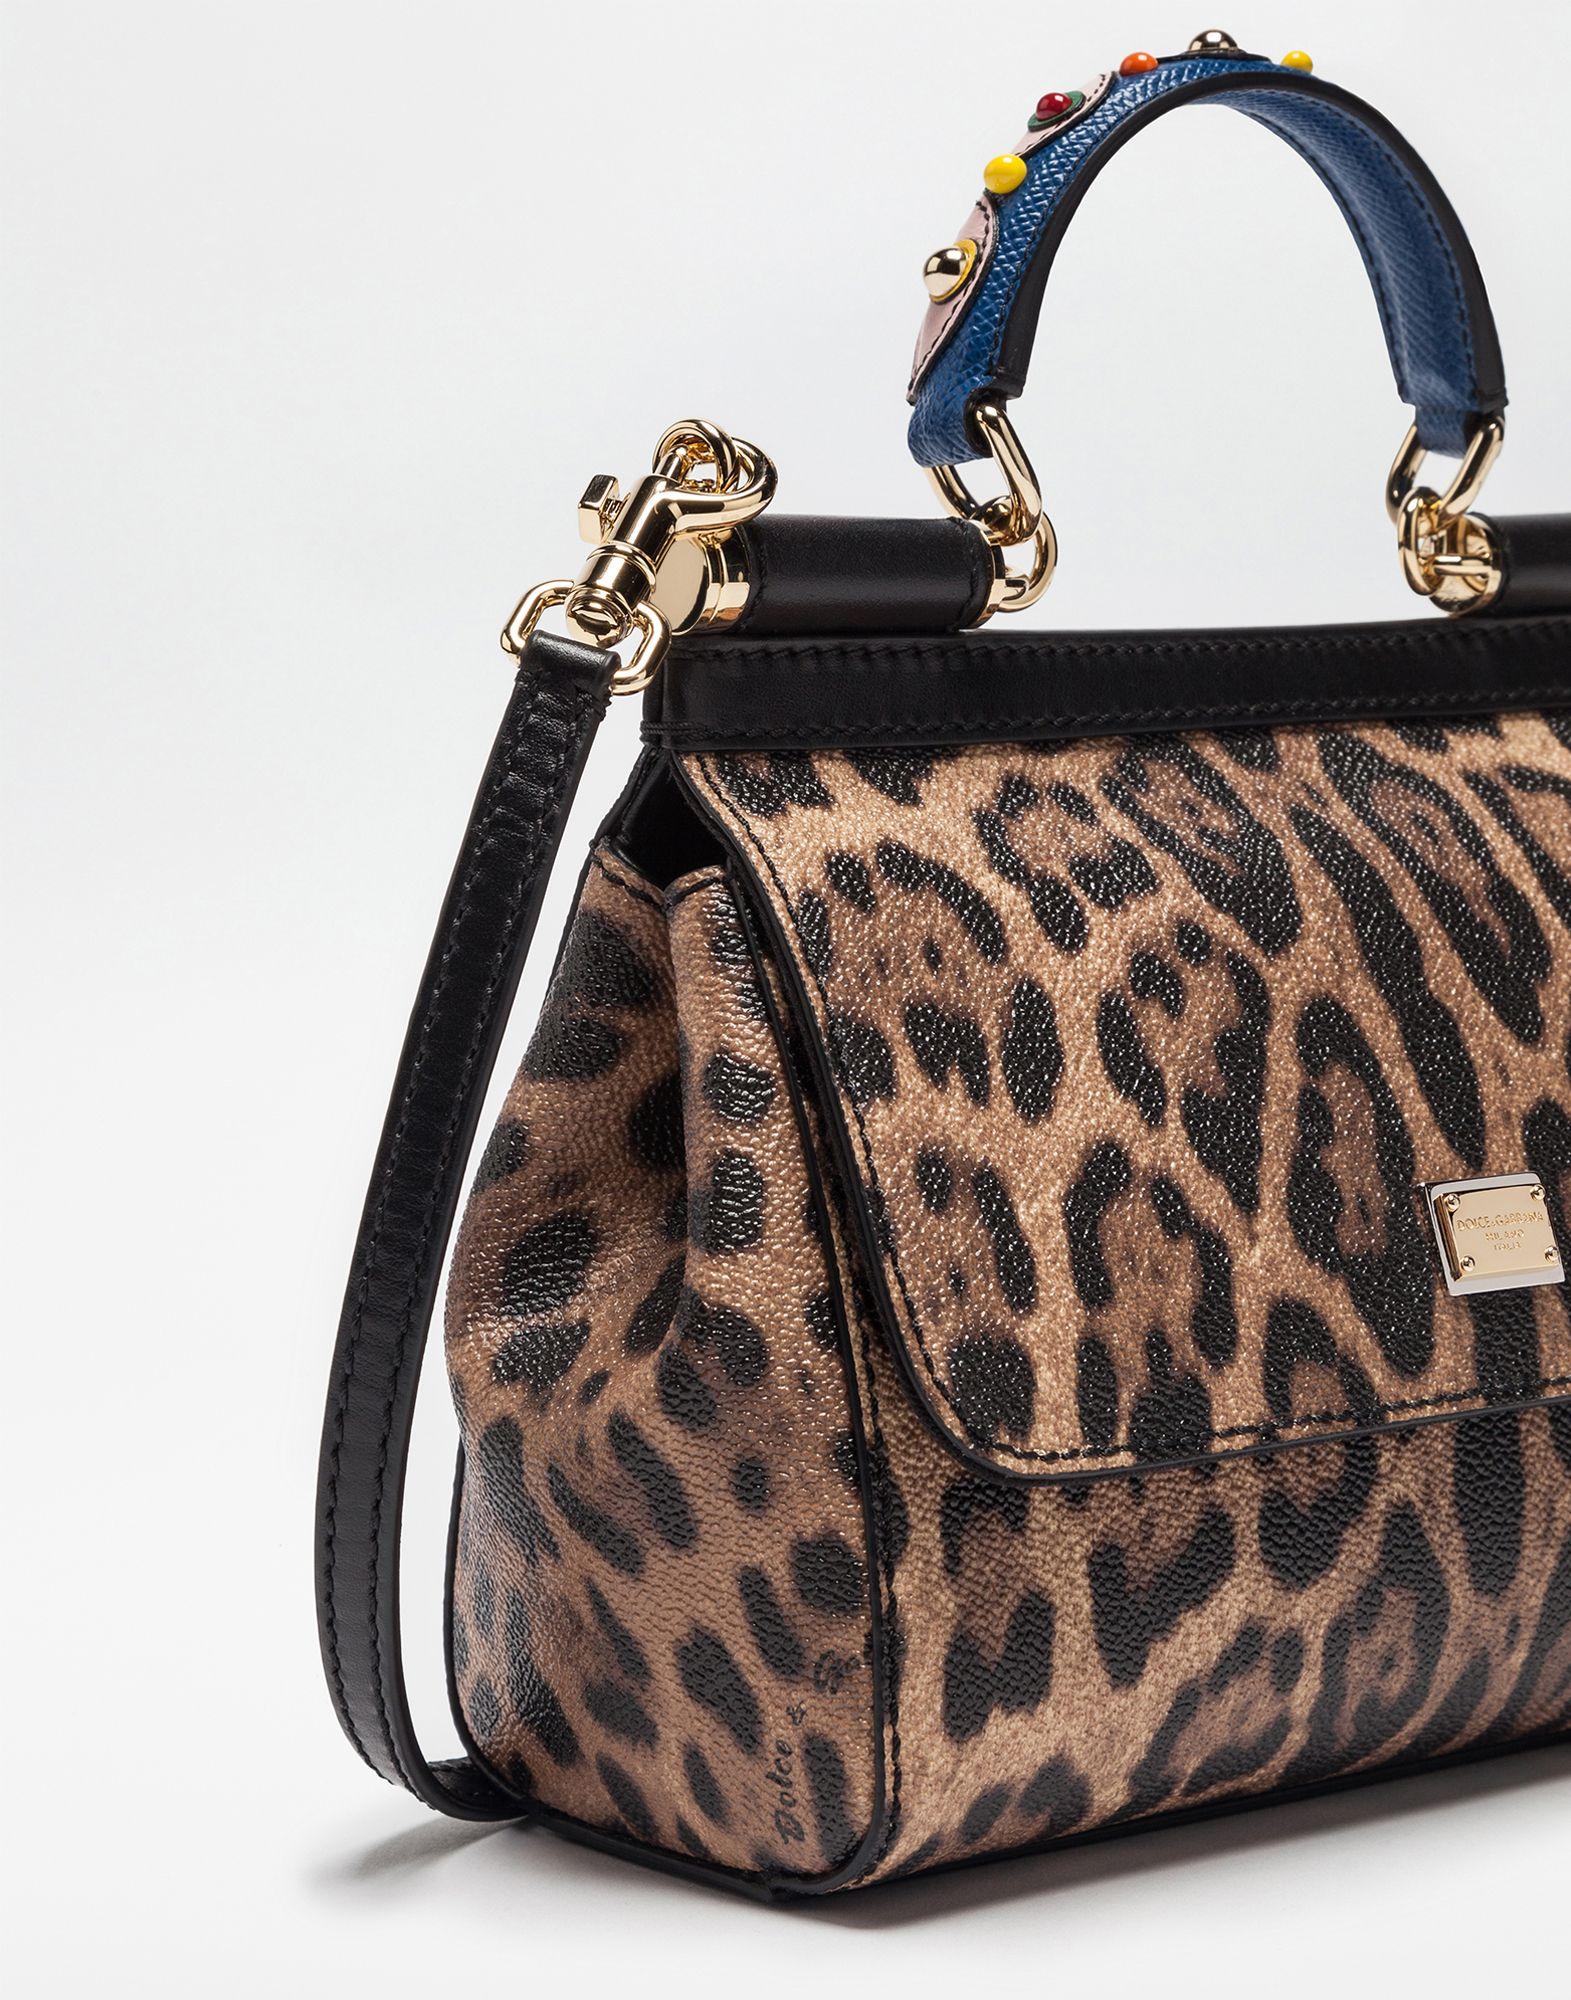 731789c661 Dolce   Gabbana SICILY BAG leopard SS 2017